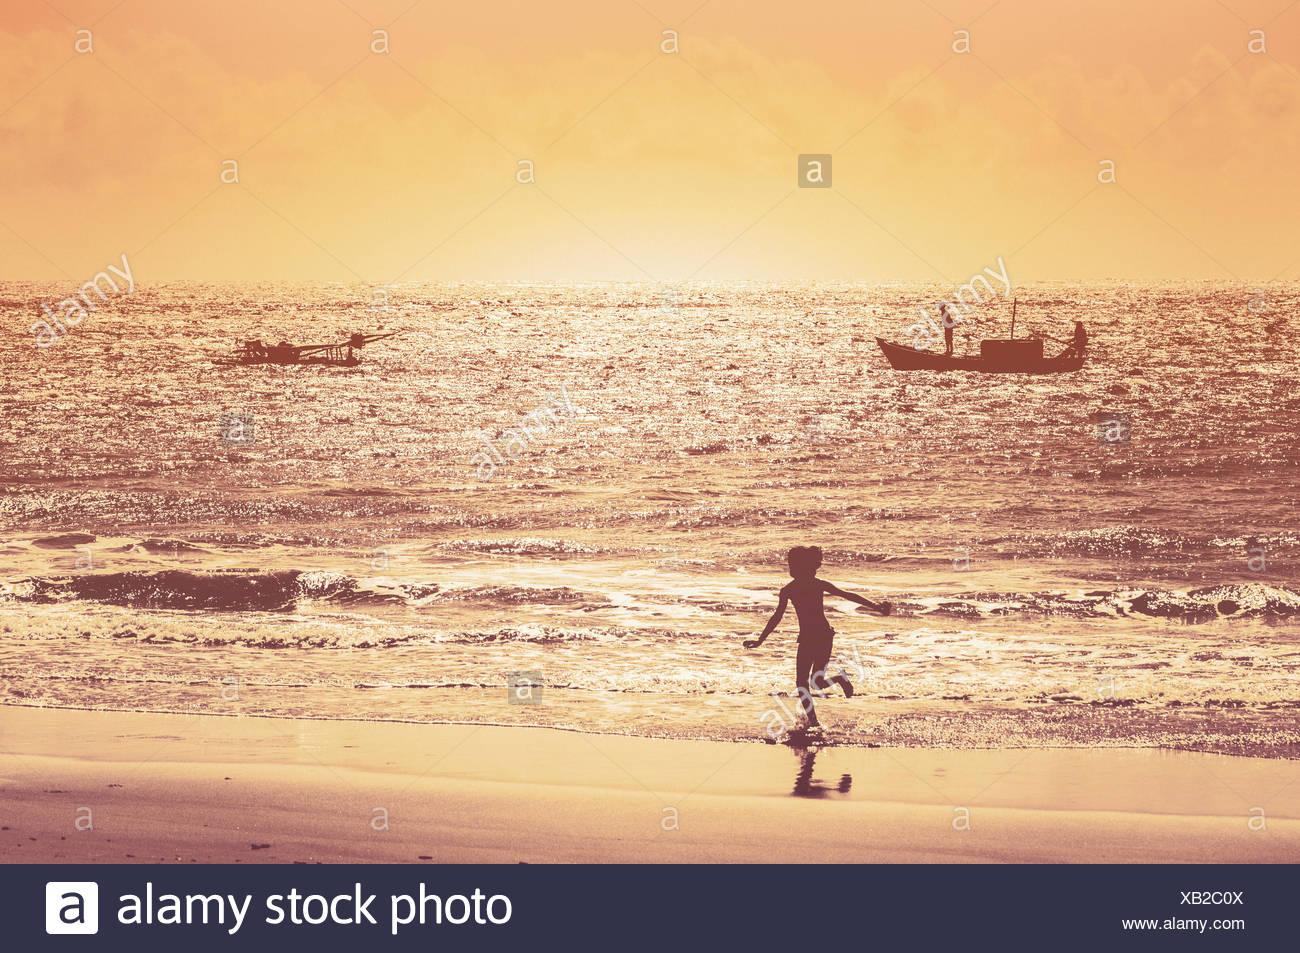 Brasil, Pirangi, Rio Grande do Norte, niña corriendo por la playa al atardecer. Imagen De Stock